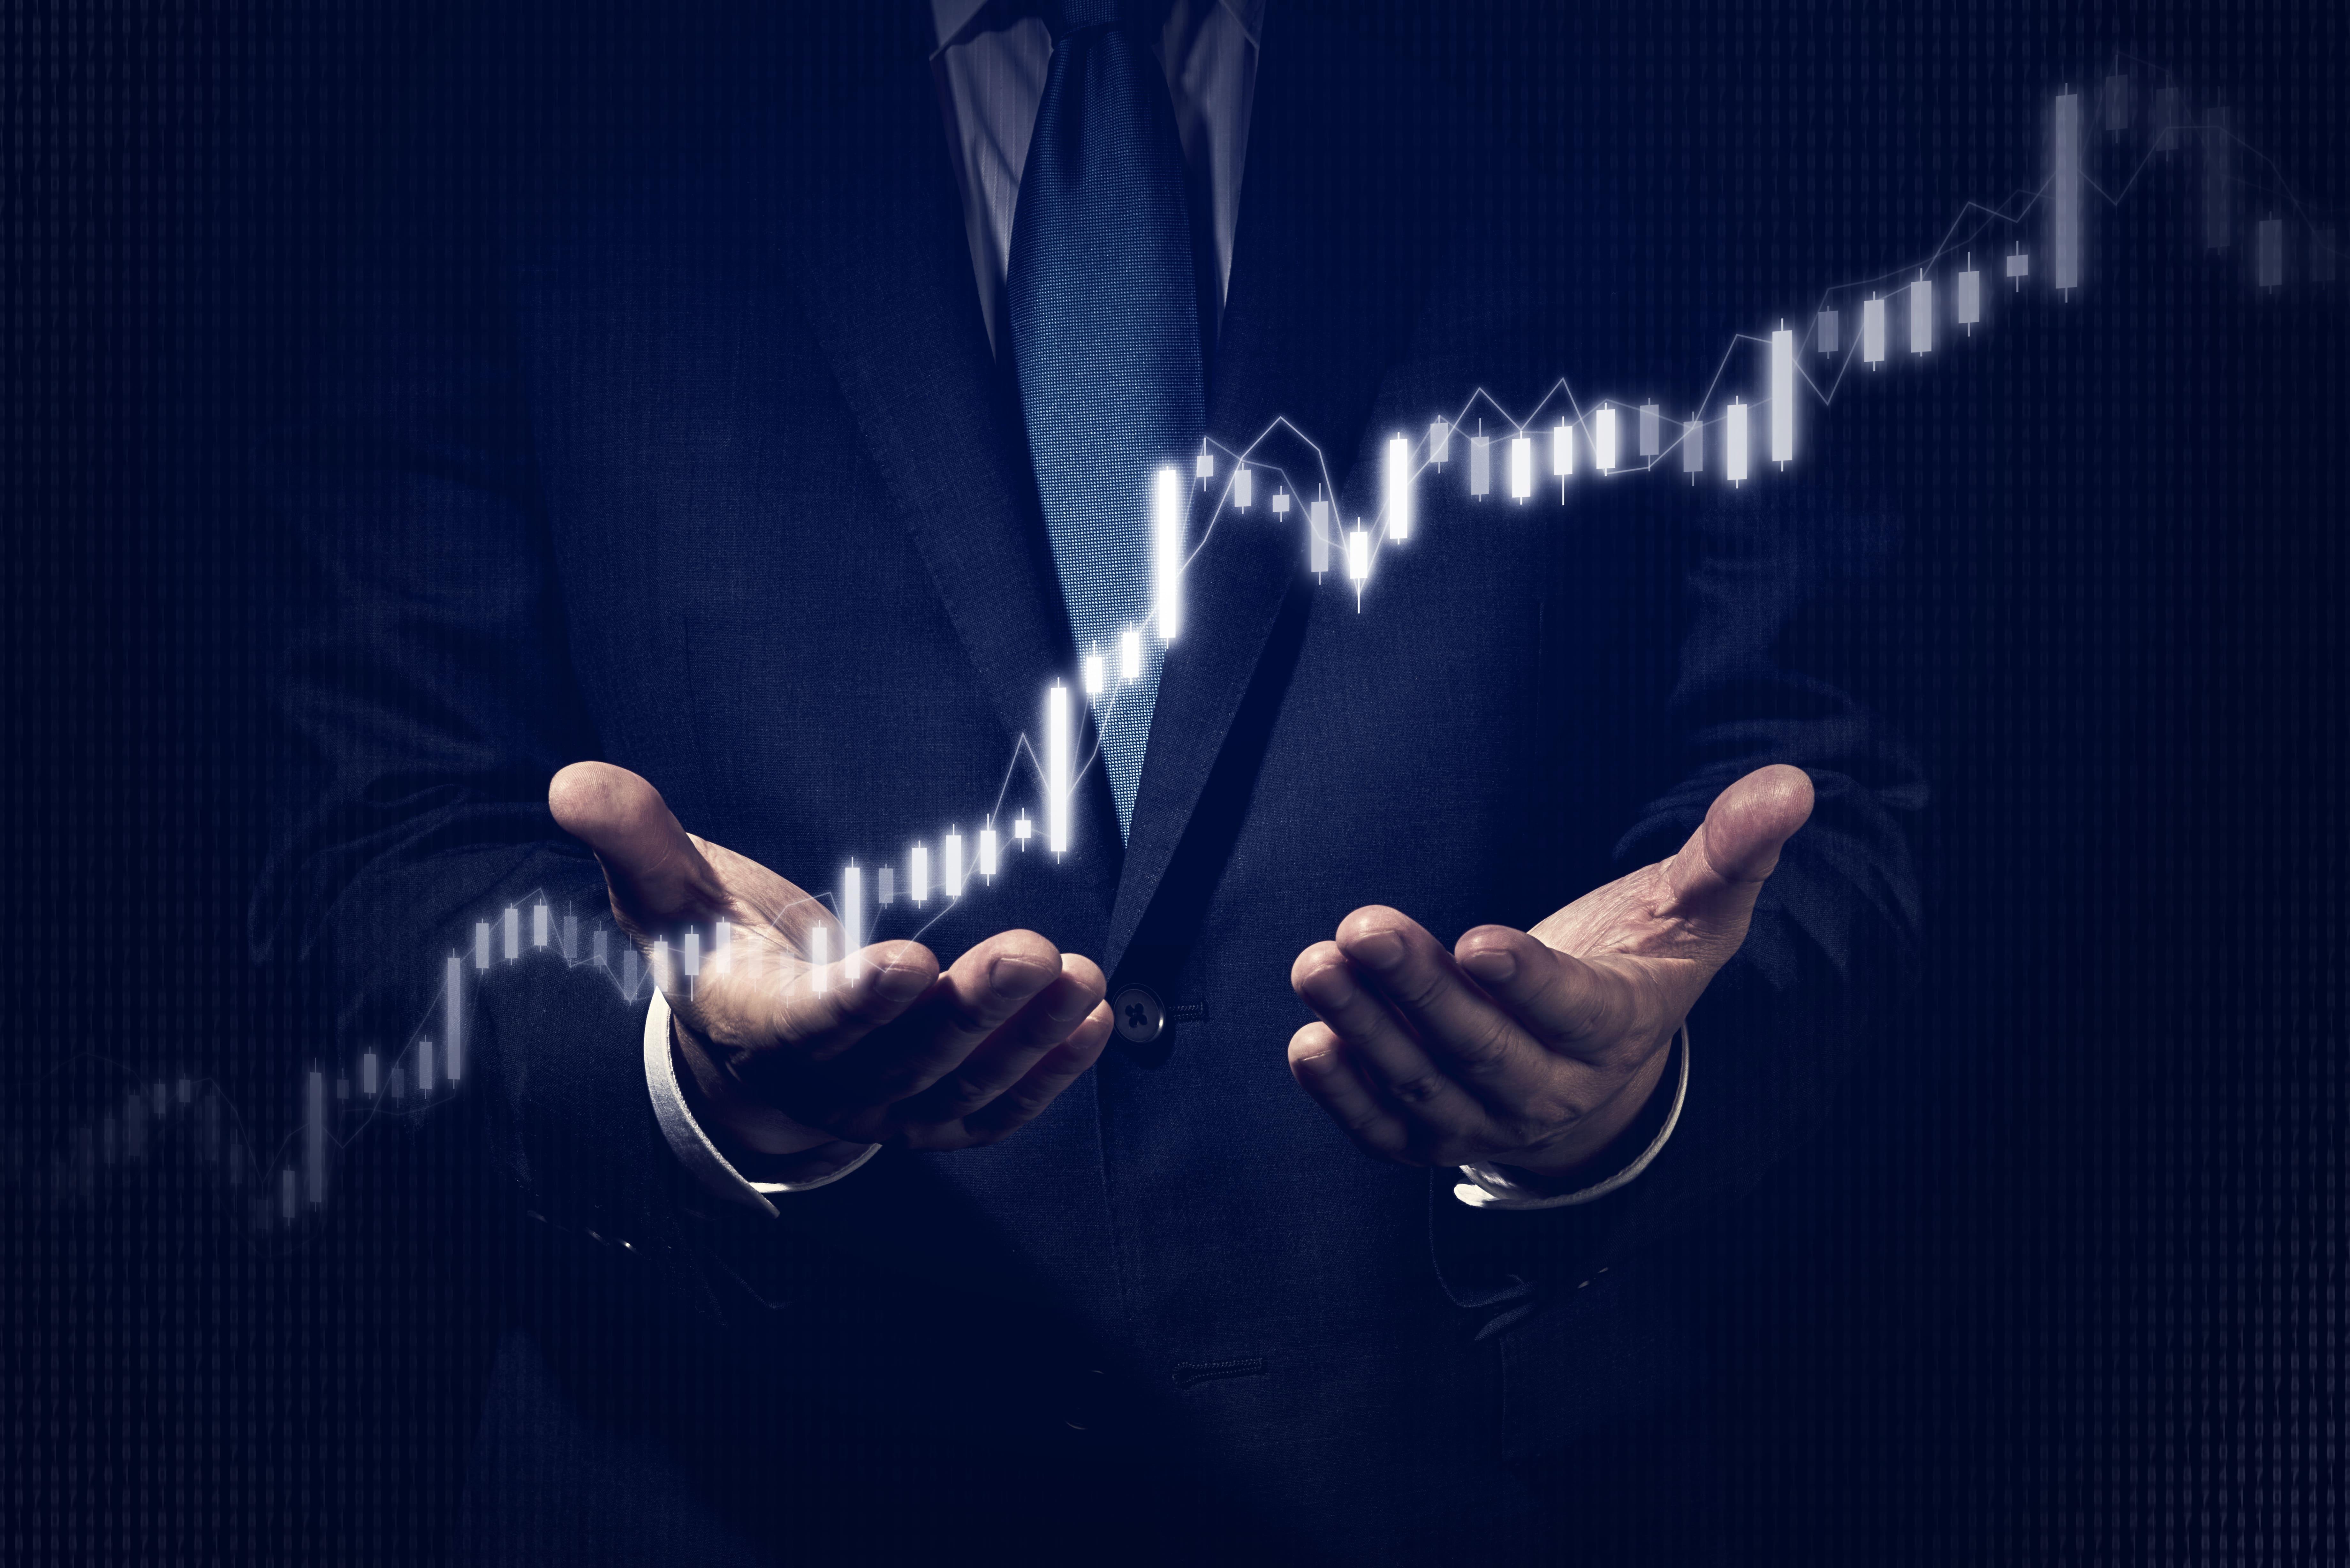 FXはあなた求めるリターン(利益)次第でリスク(損失)が左右する